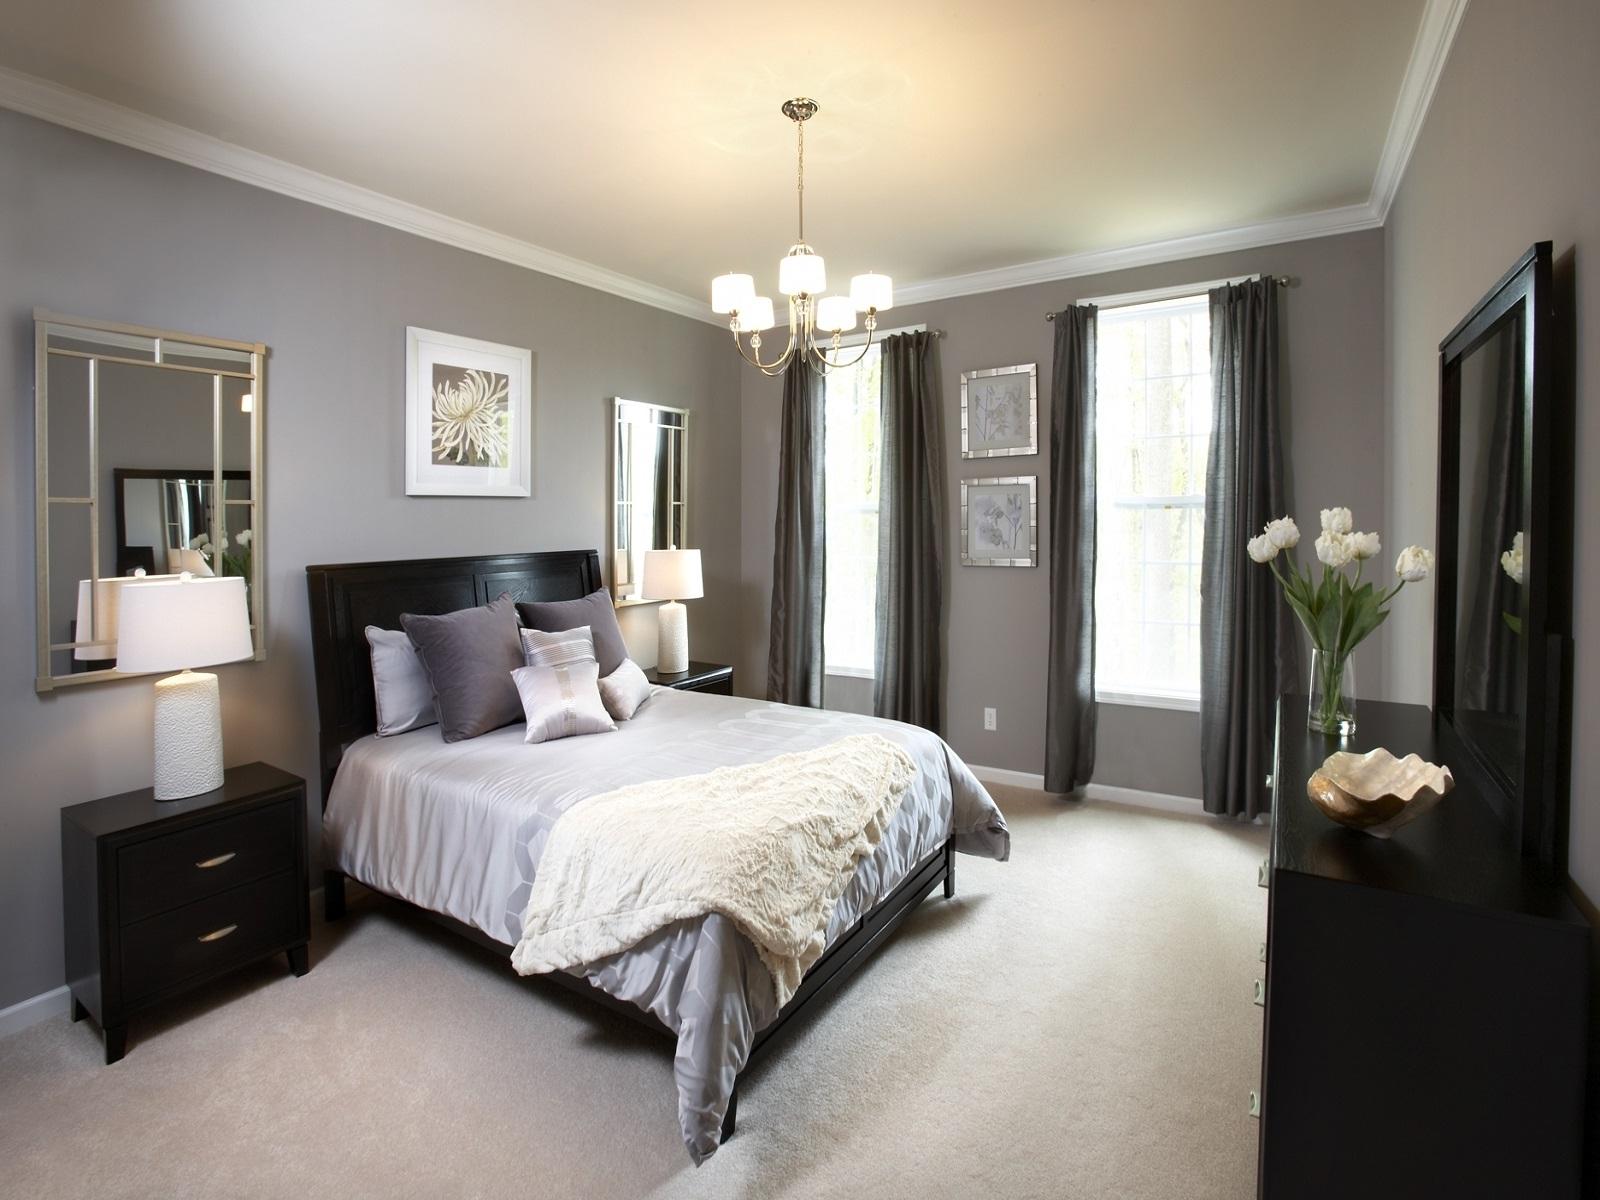 furniture ideas in bedroom photo - 9